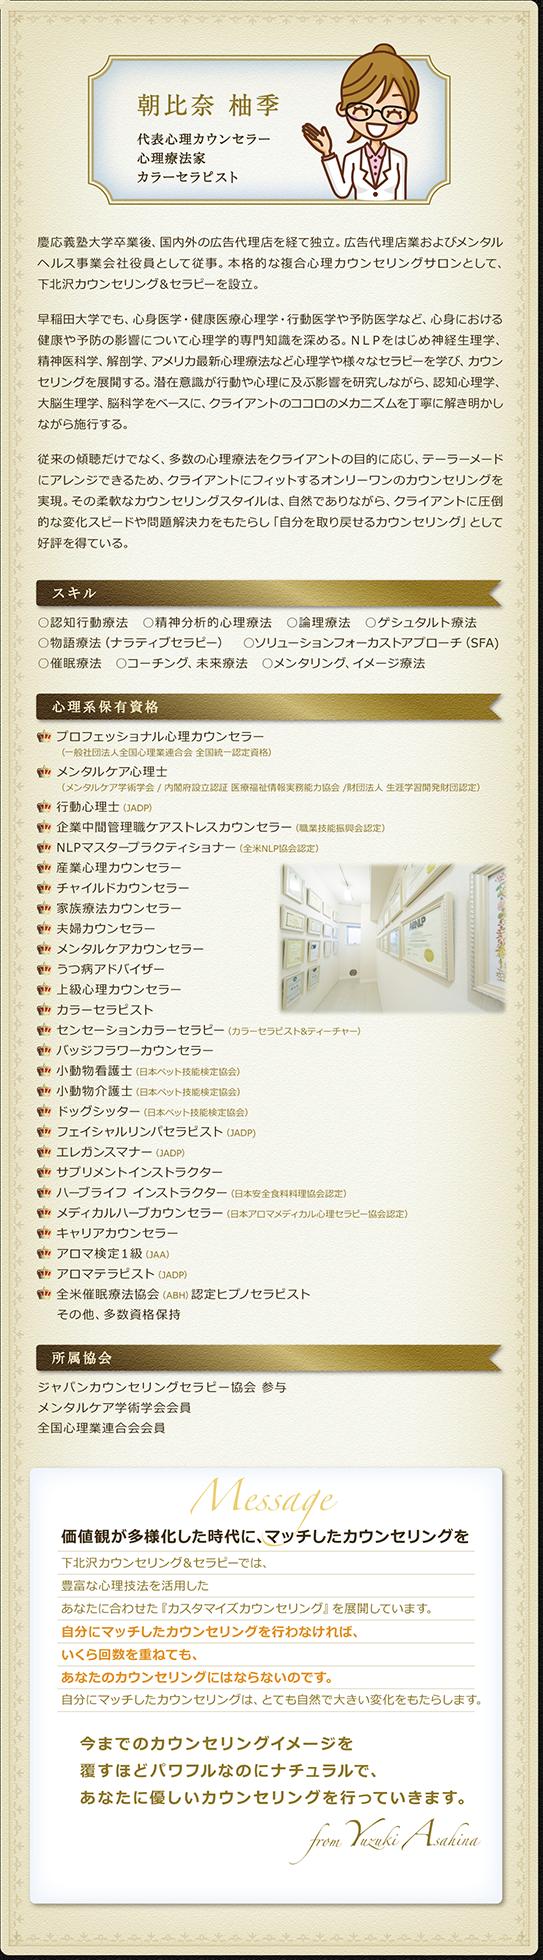 tokyo_setagaya_shimokitazawa_counseling1